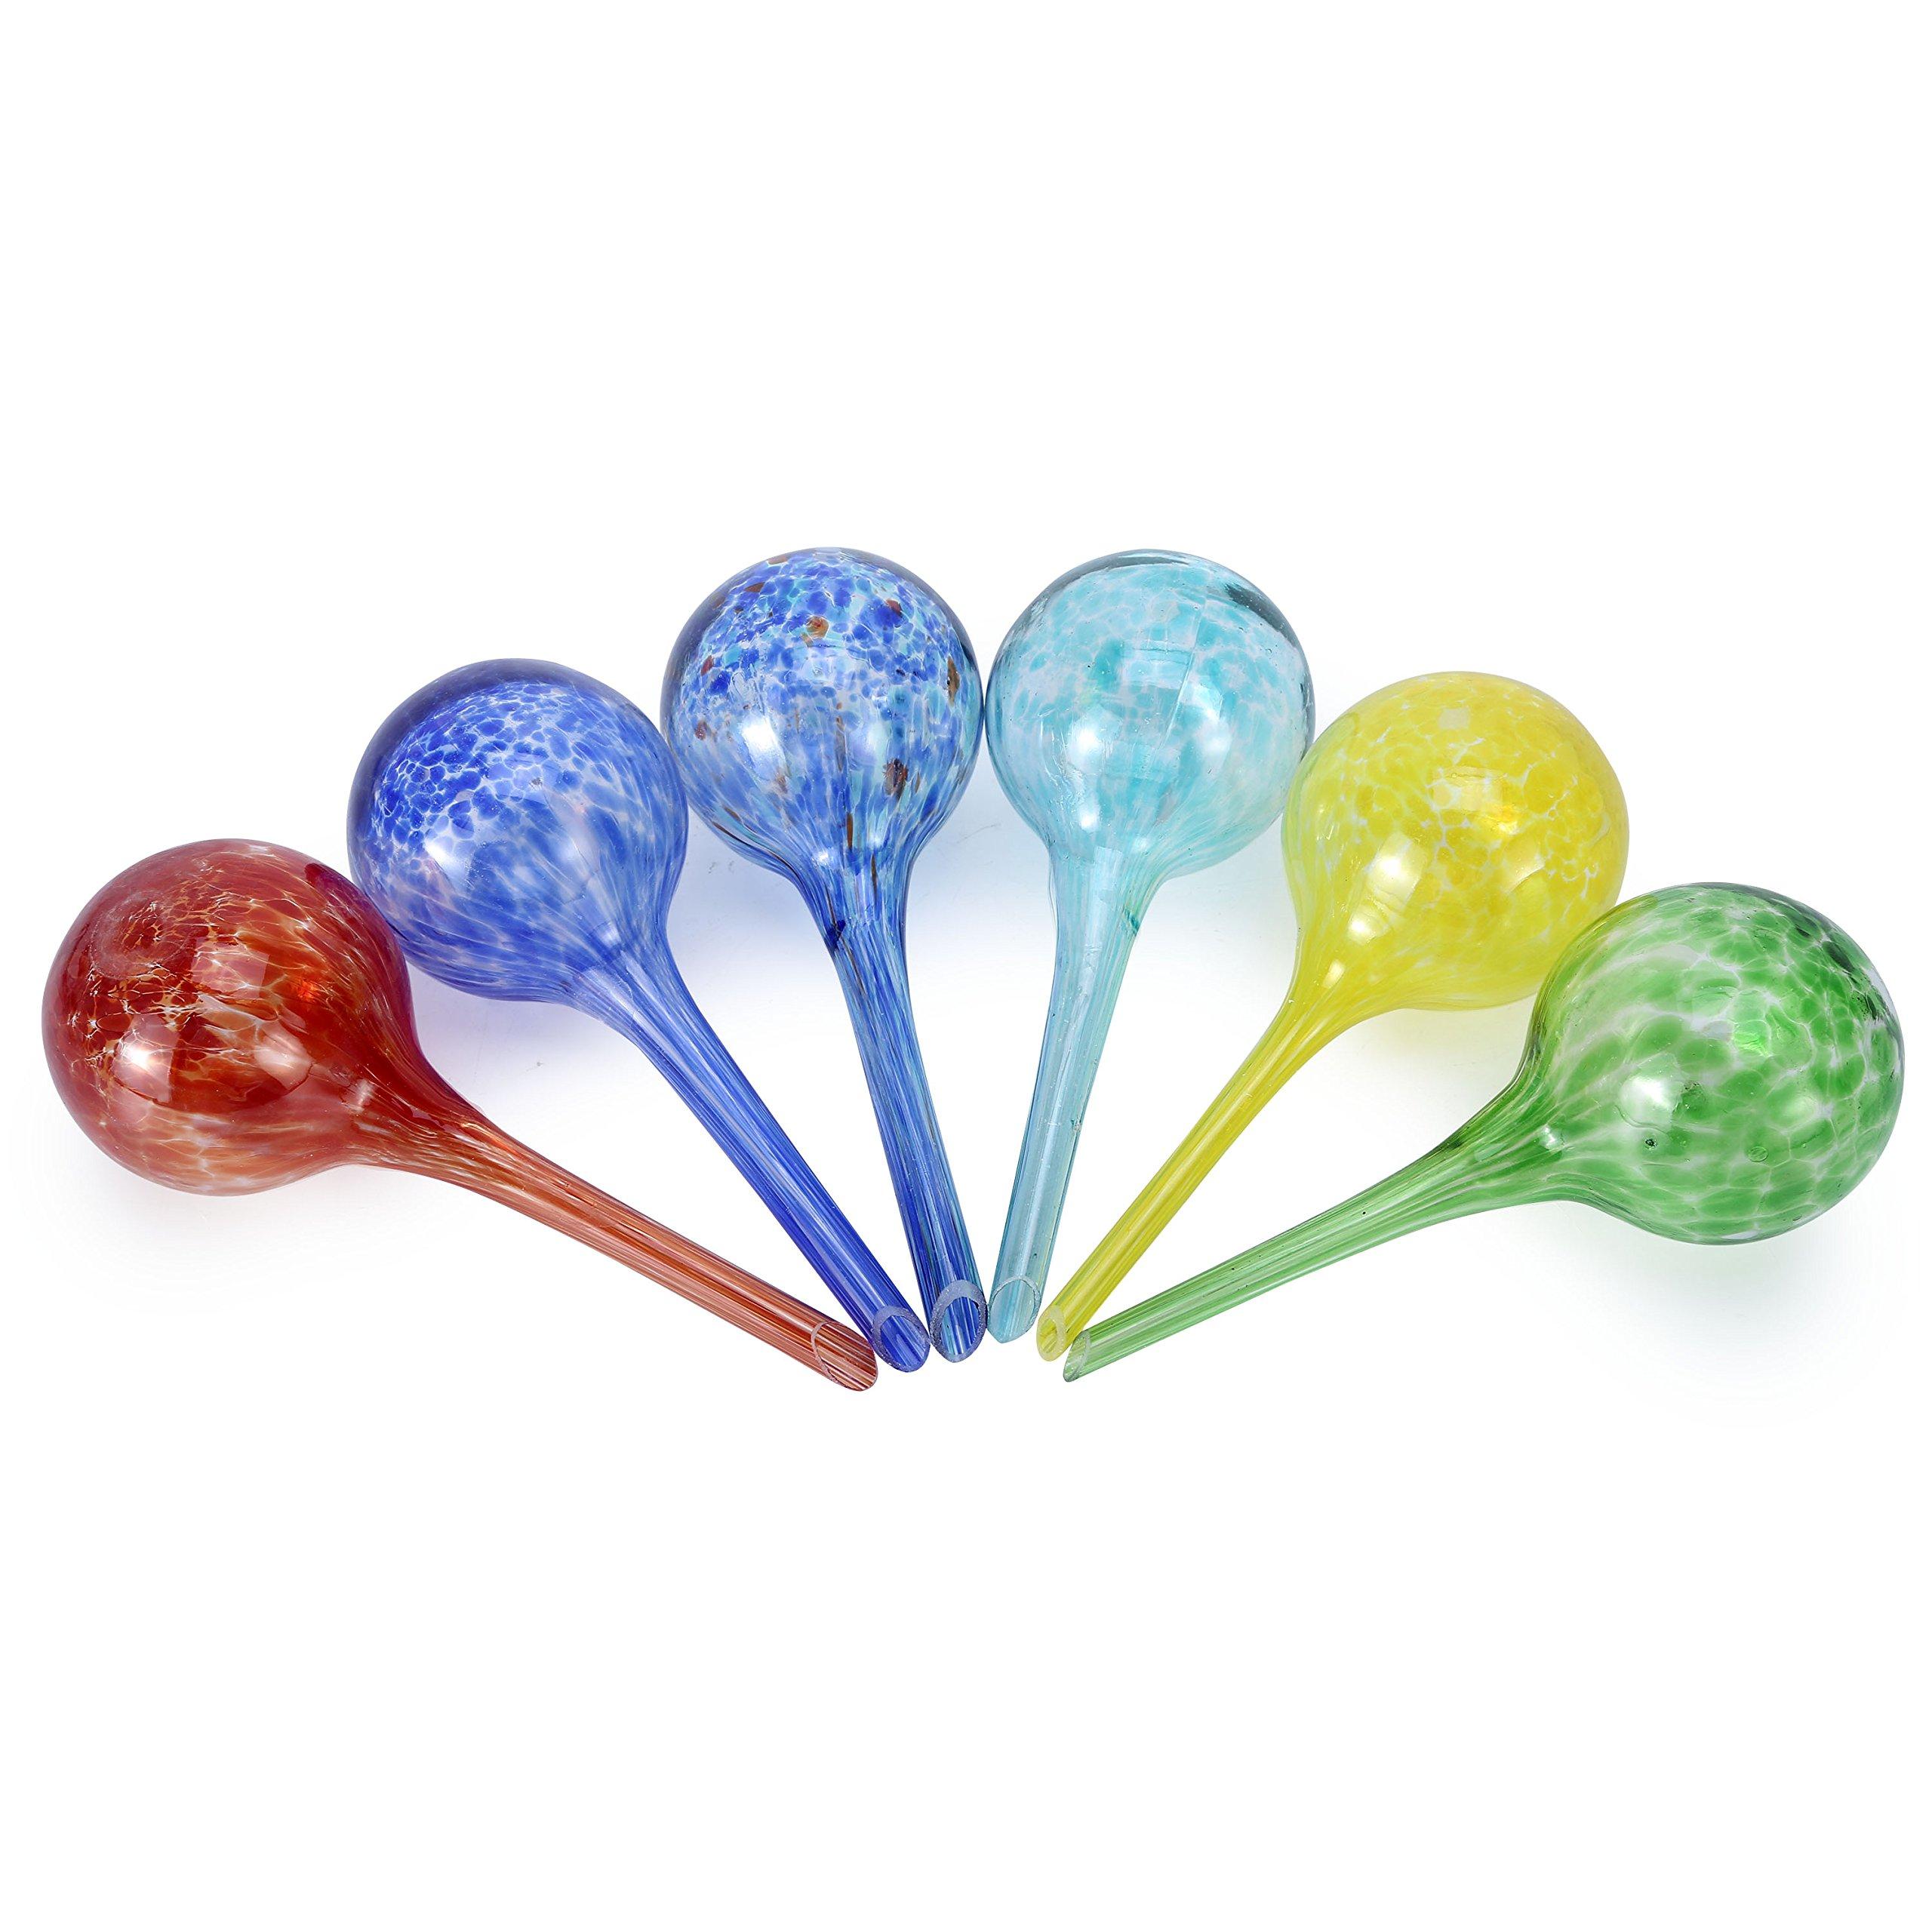 Asvert Self Watering Globes Mini Glass Plant Waterer Decorative Watering Bulb 6 Pack by Asvert